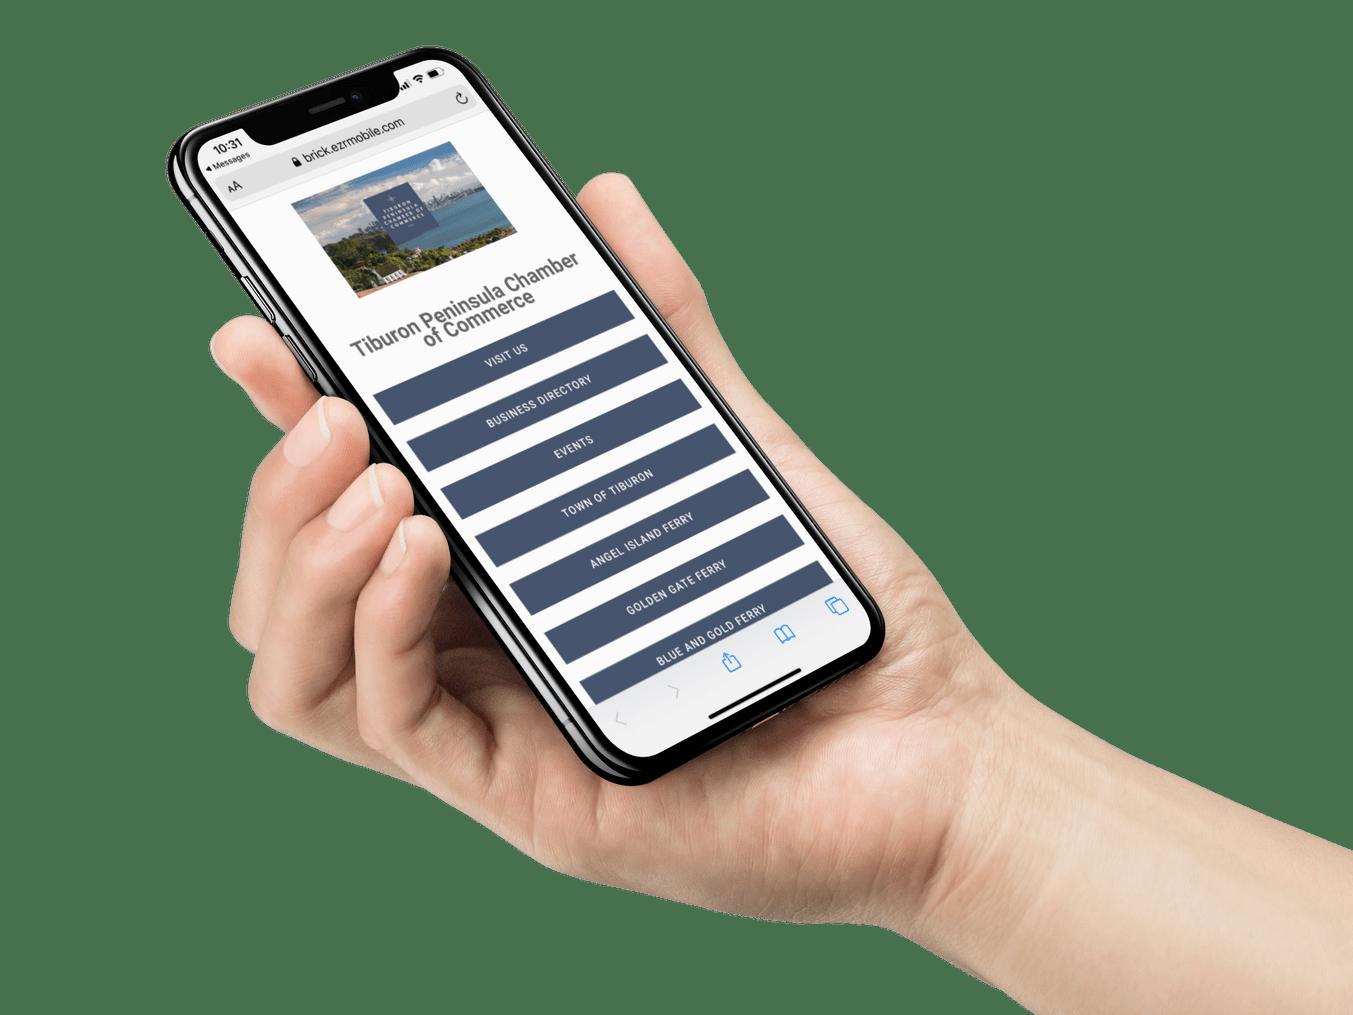 EZR Brick & Mortar — Tiburon Chamber of Commerce